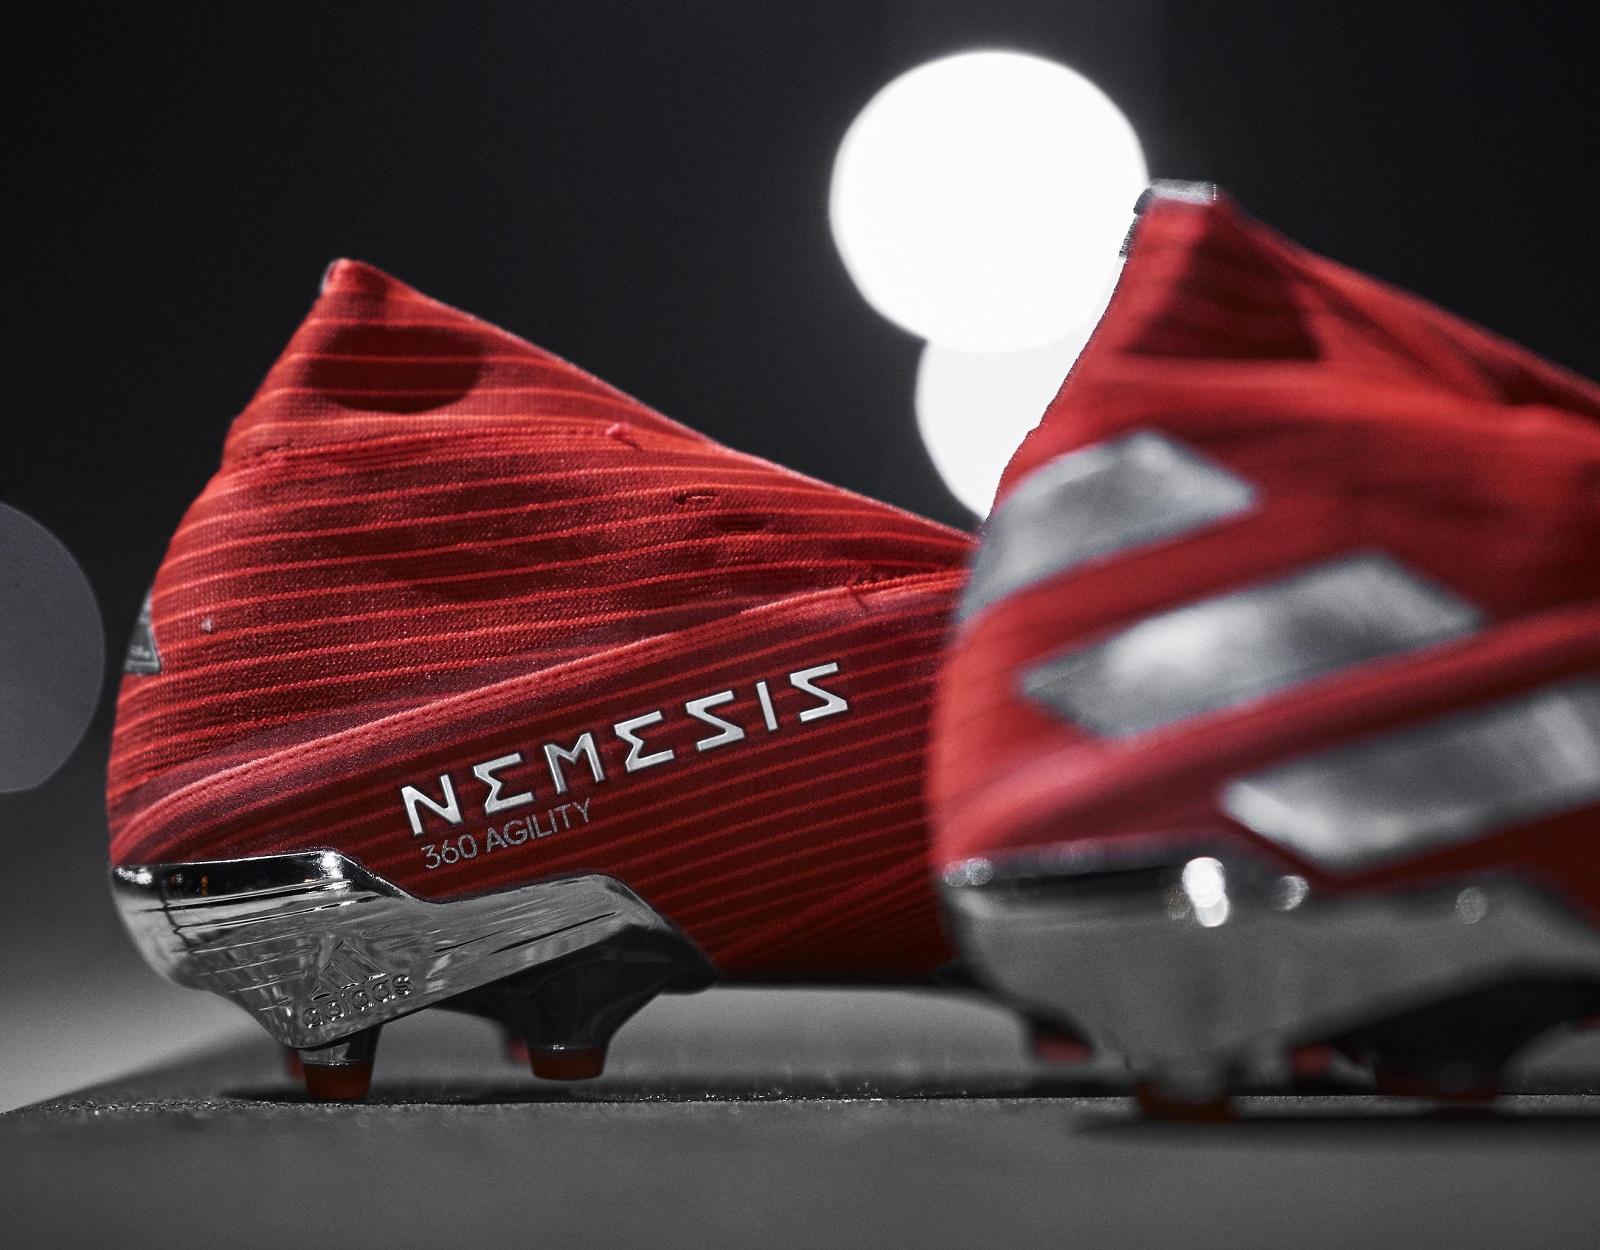 5552baa89 adidas Nemeziz 19 Released - Next Generation Agility!